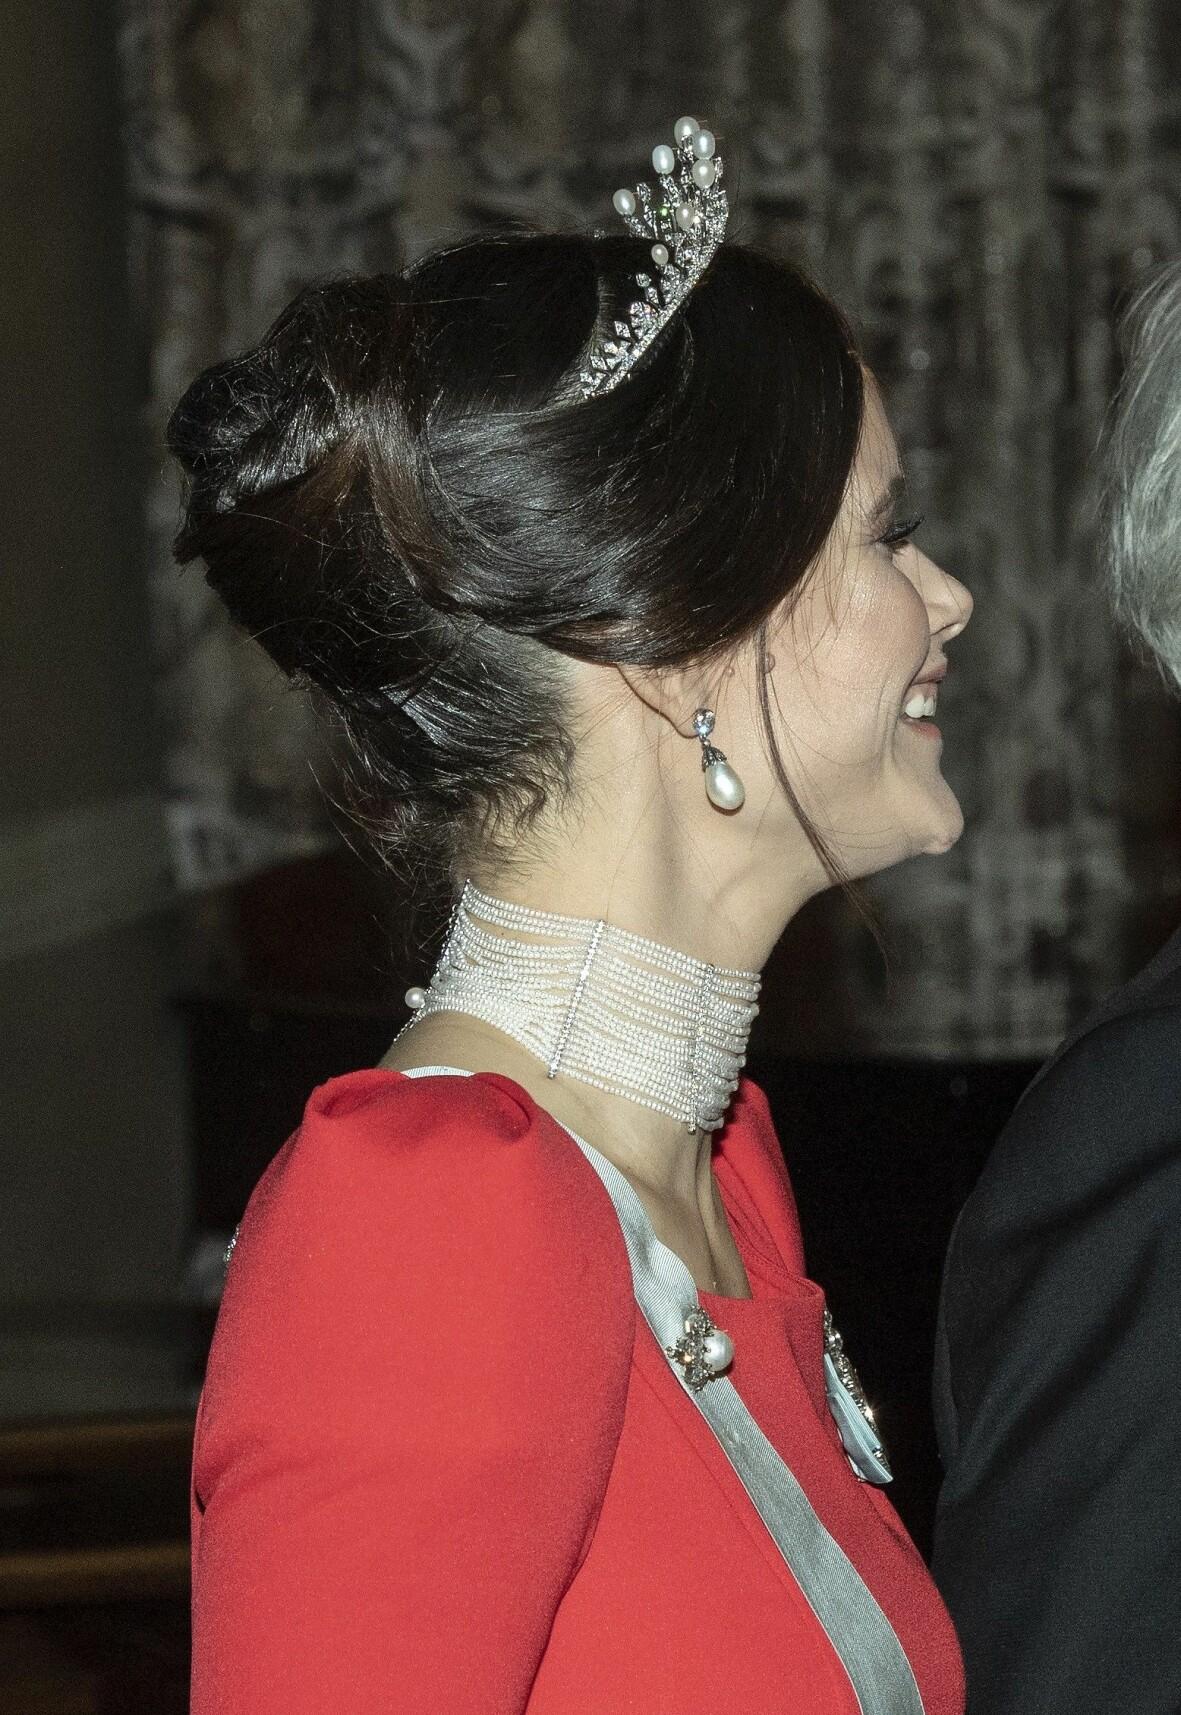 Halsbandet som prinsessan Sofia bar på nobelfesten var gjort av Amanda Weibull Laurell.